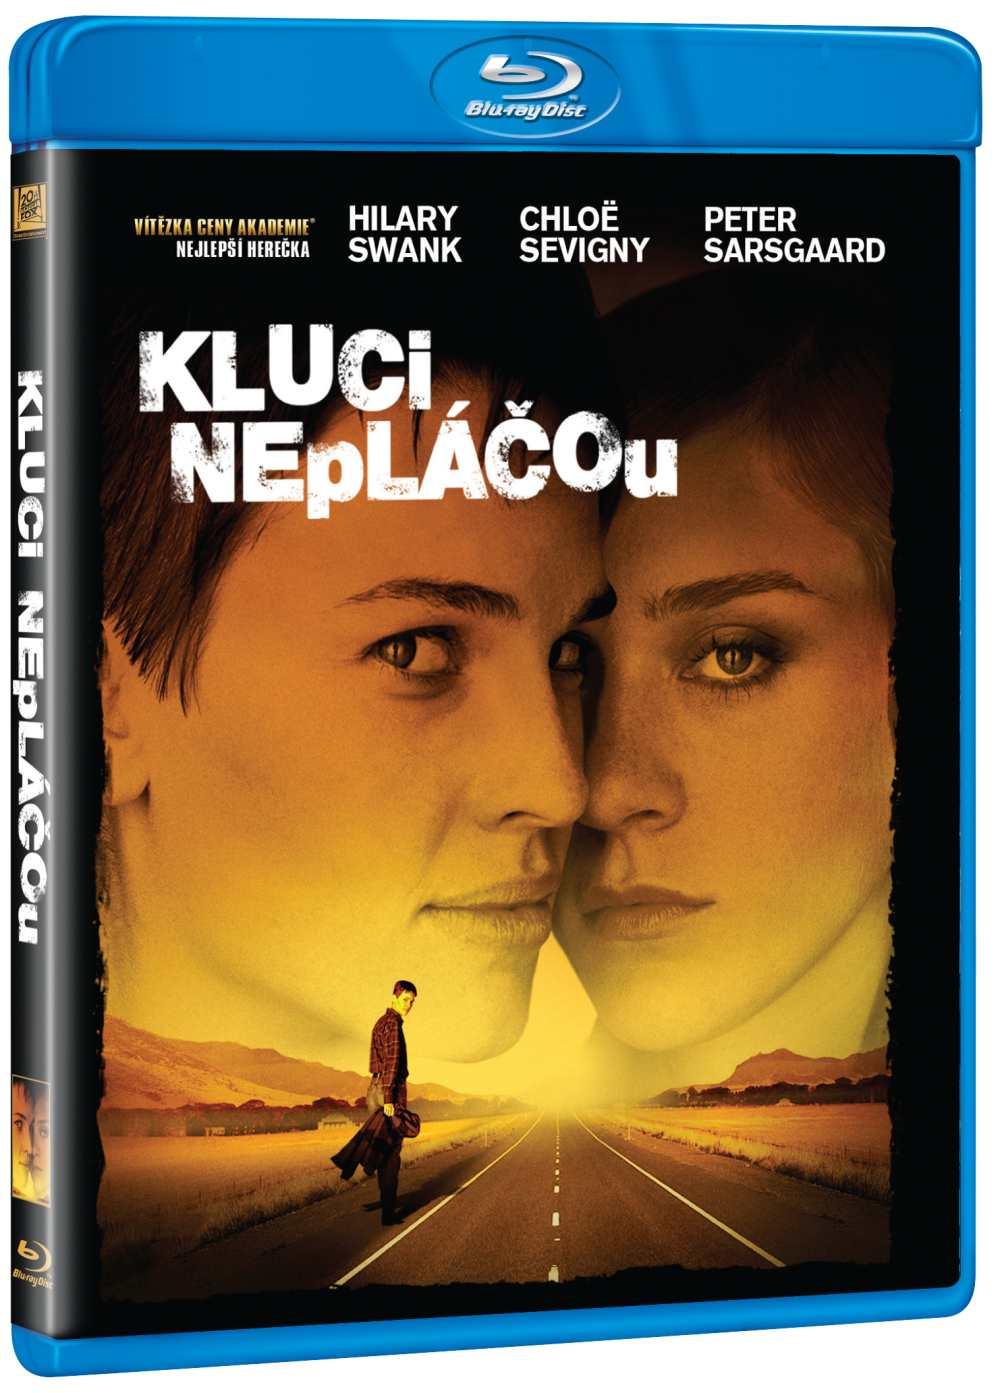 KLUCI NEPLÁČOU - Blu-ray